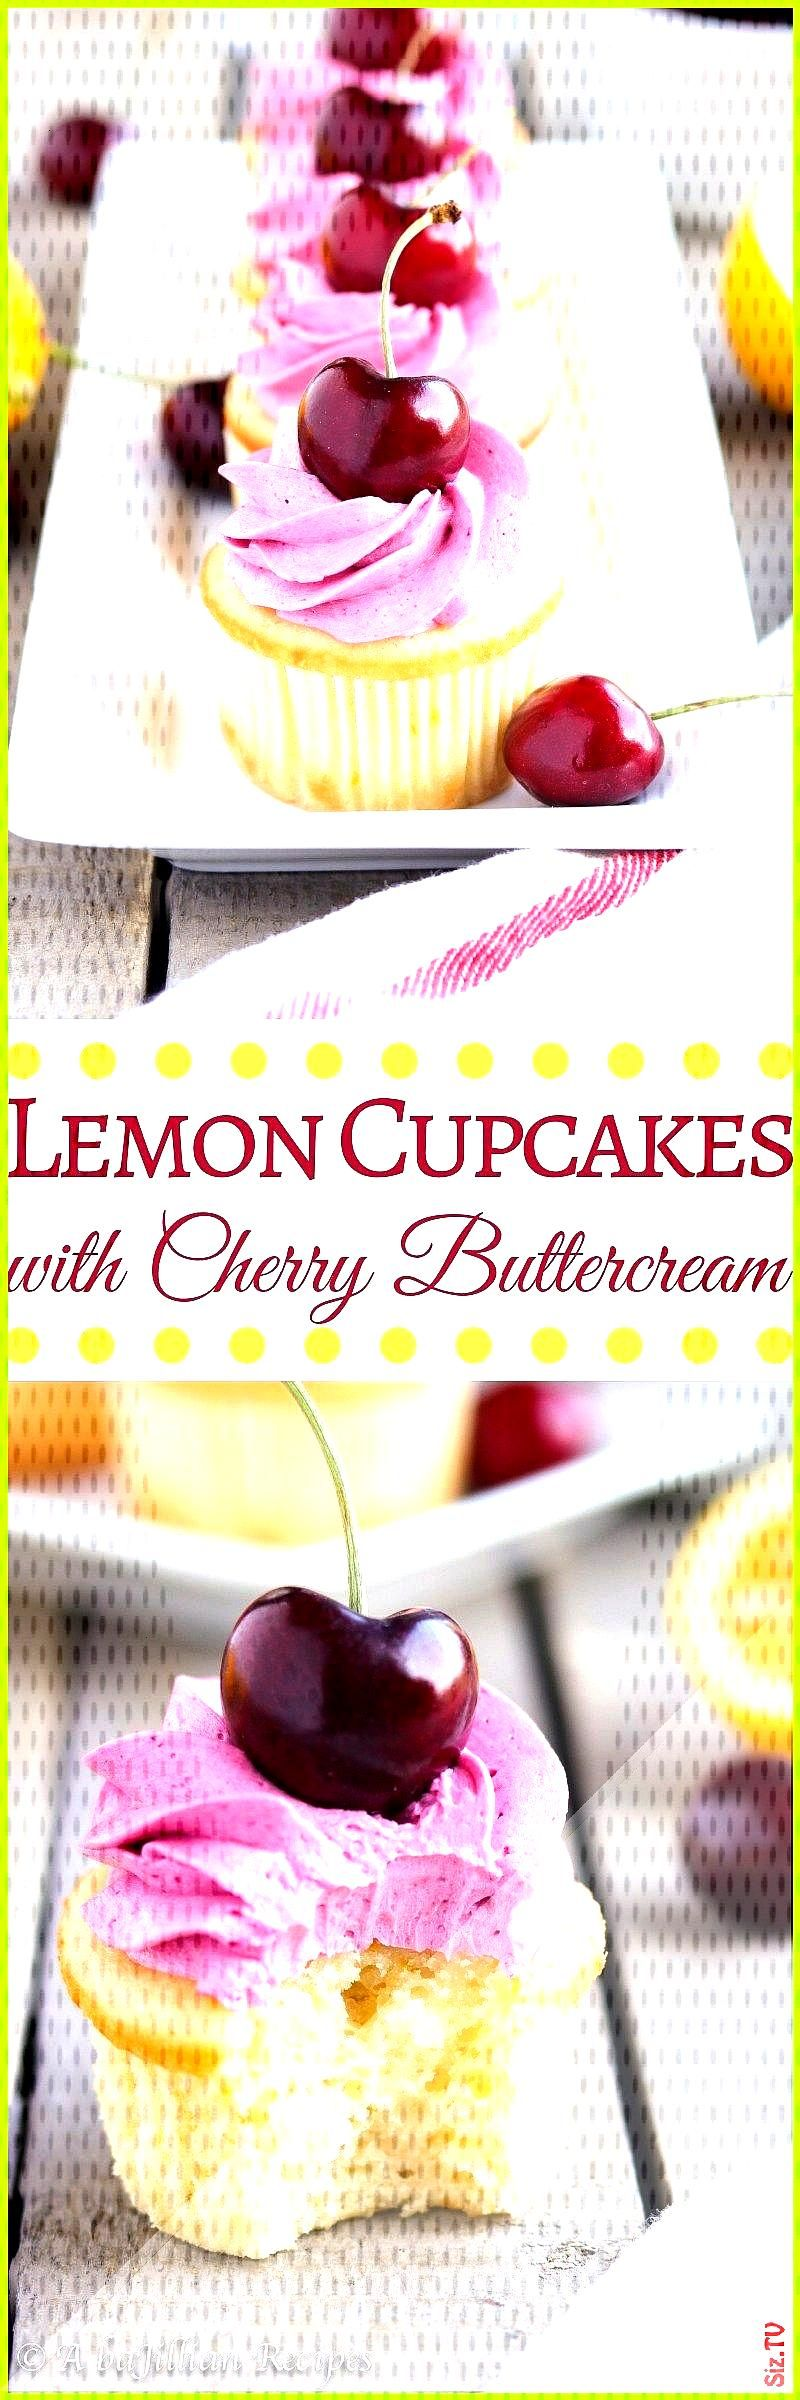 Lemon Cupcakes with Cherry Buttercream A baJillian Recipes Lemon Cupcakes with Cherry Buttercream